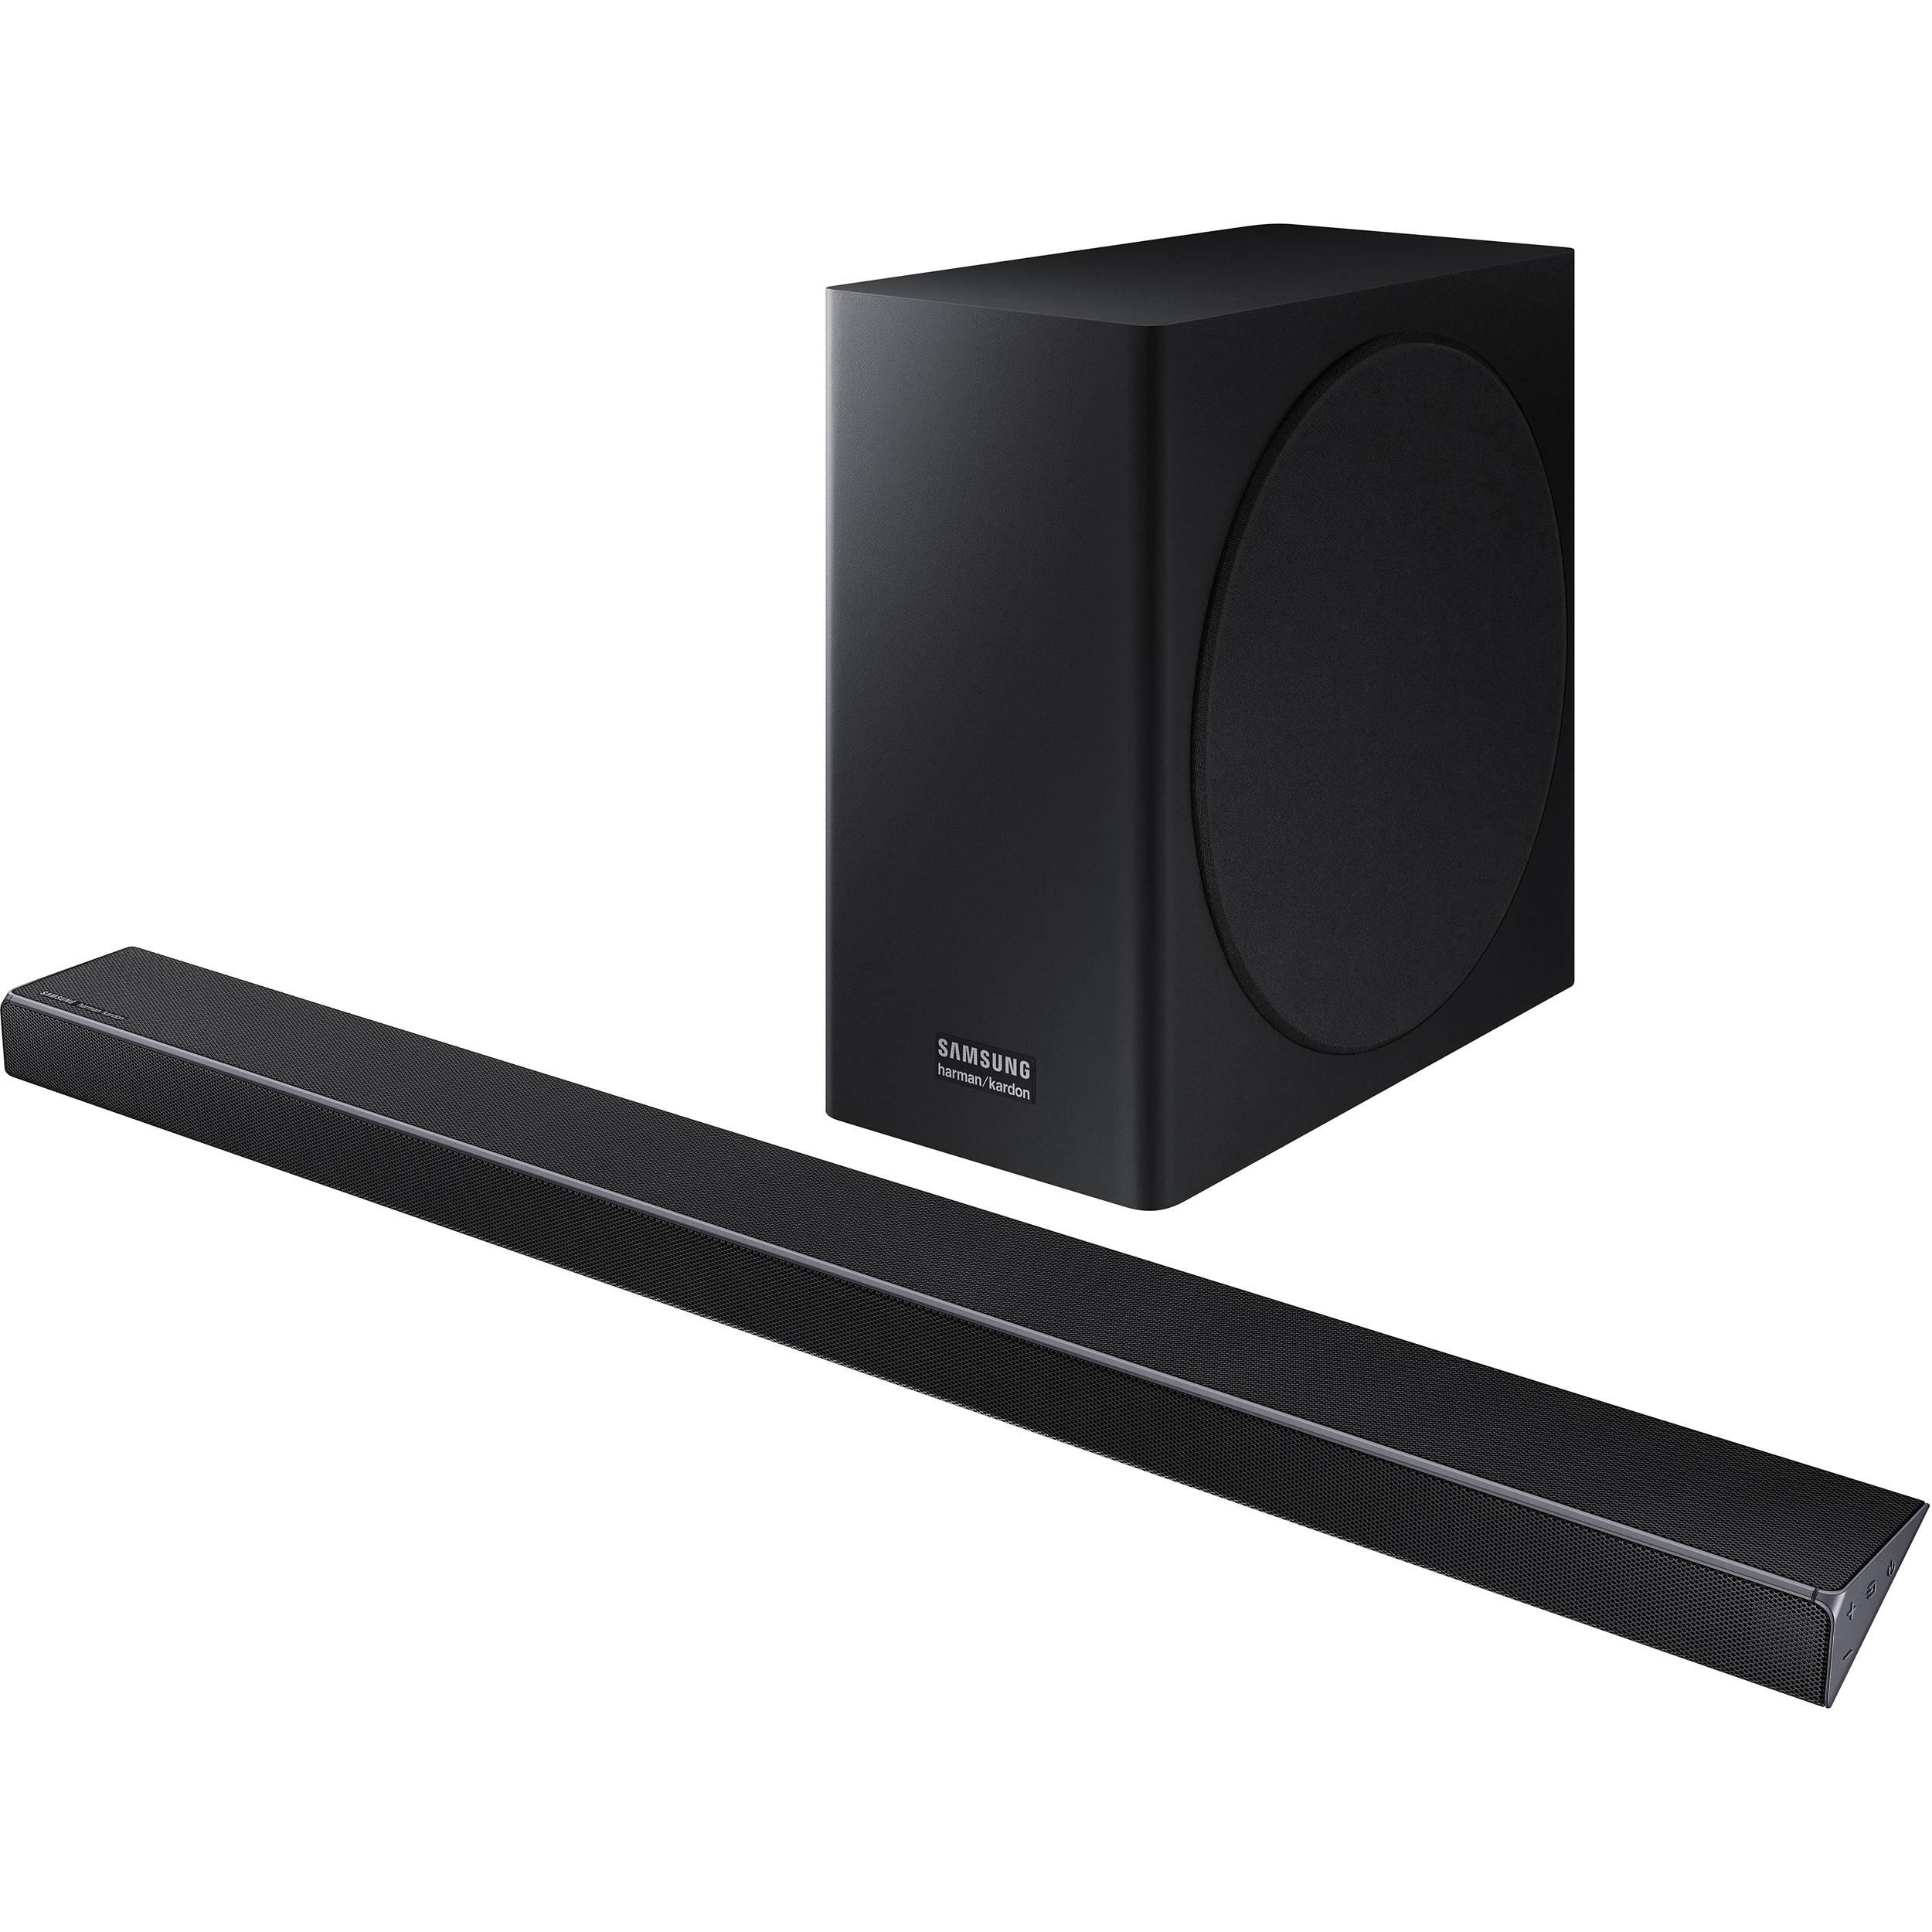 samsung hw q70r 330w 3 1 2 channel soundbar system hw q70r za. Black Bedroom Furniture Sets. Home Design Ideas